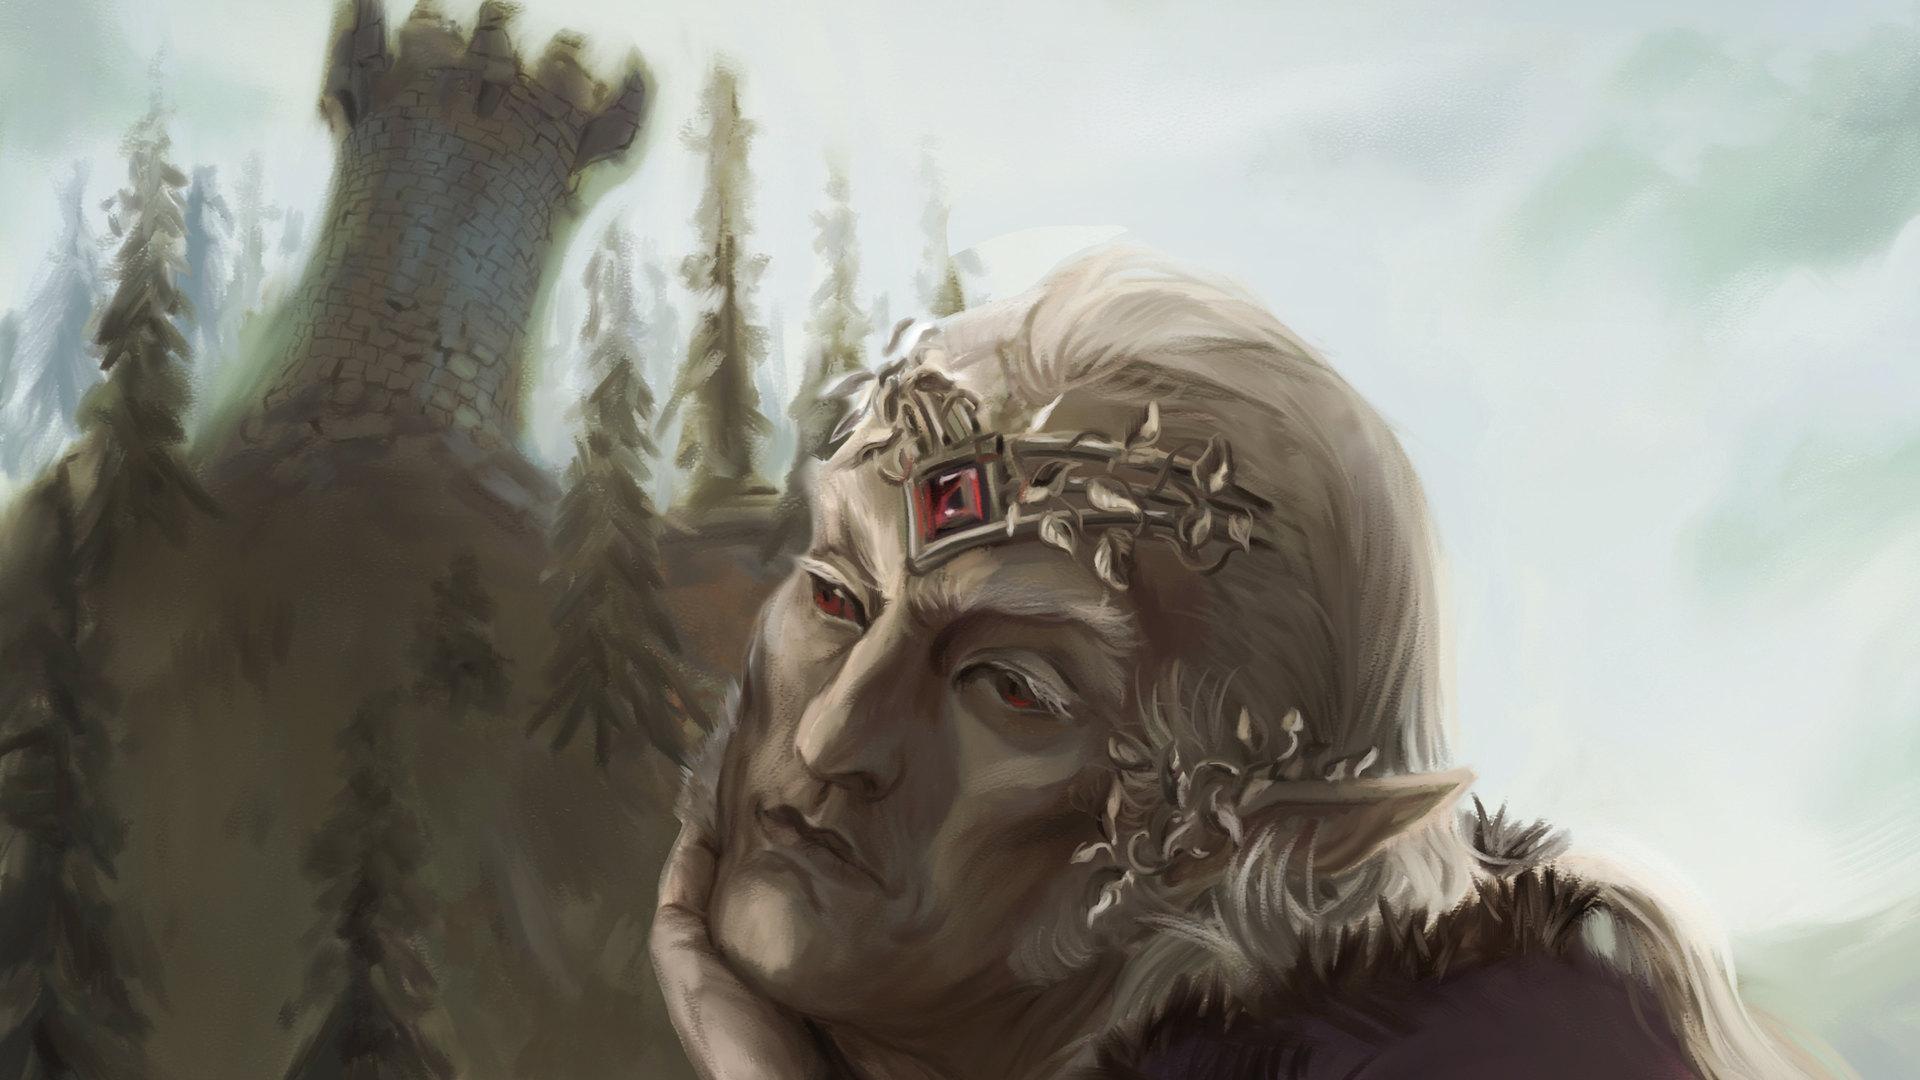 Speed Painting La Lassitude du roi elfe by McFly-Illustration